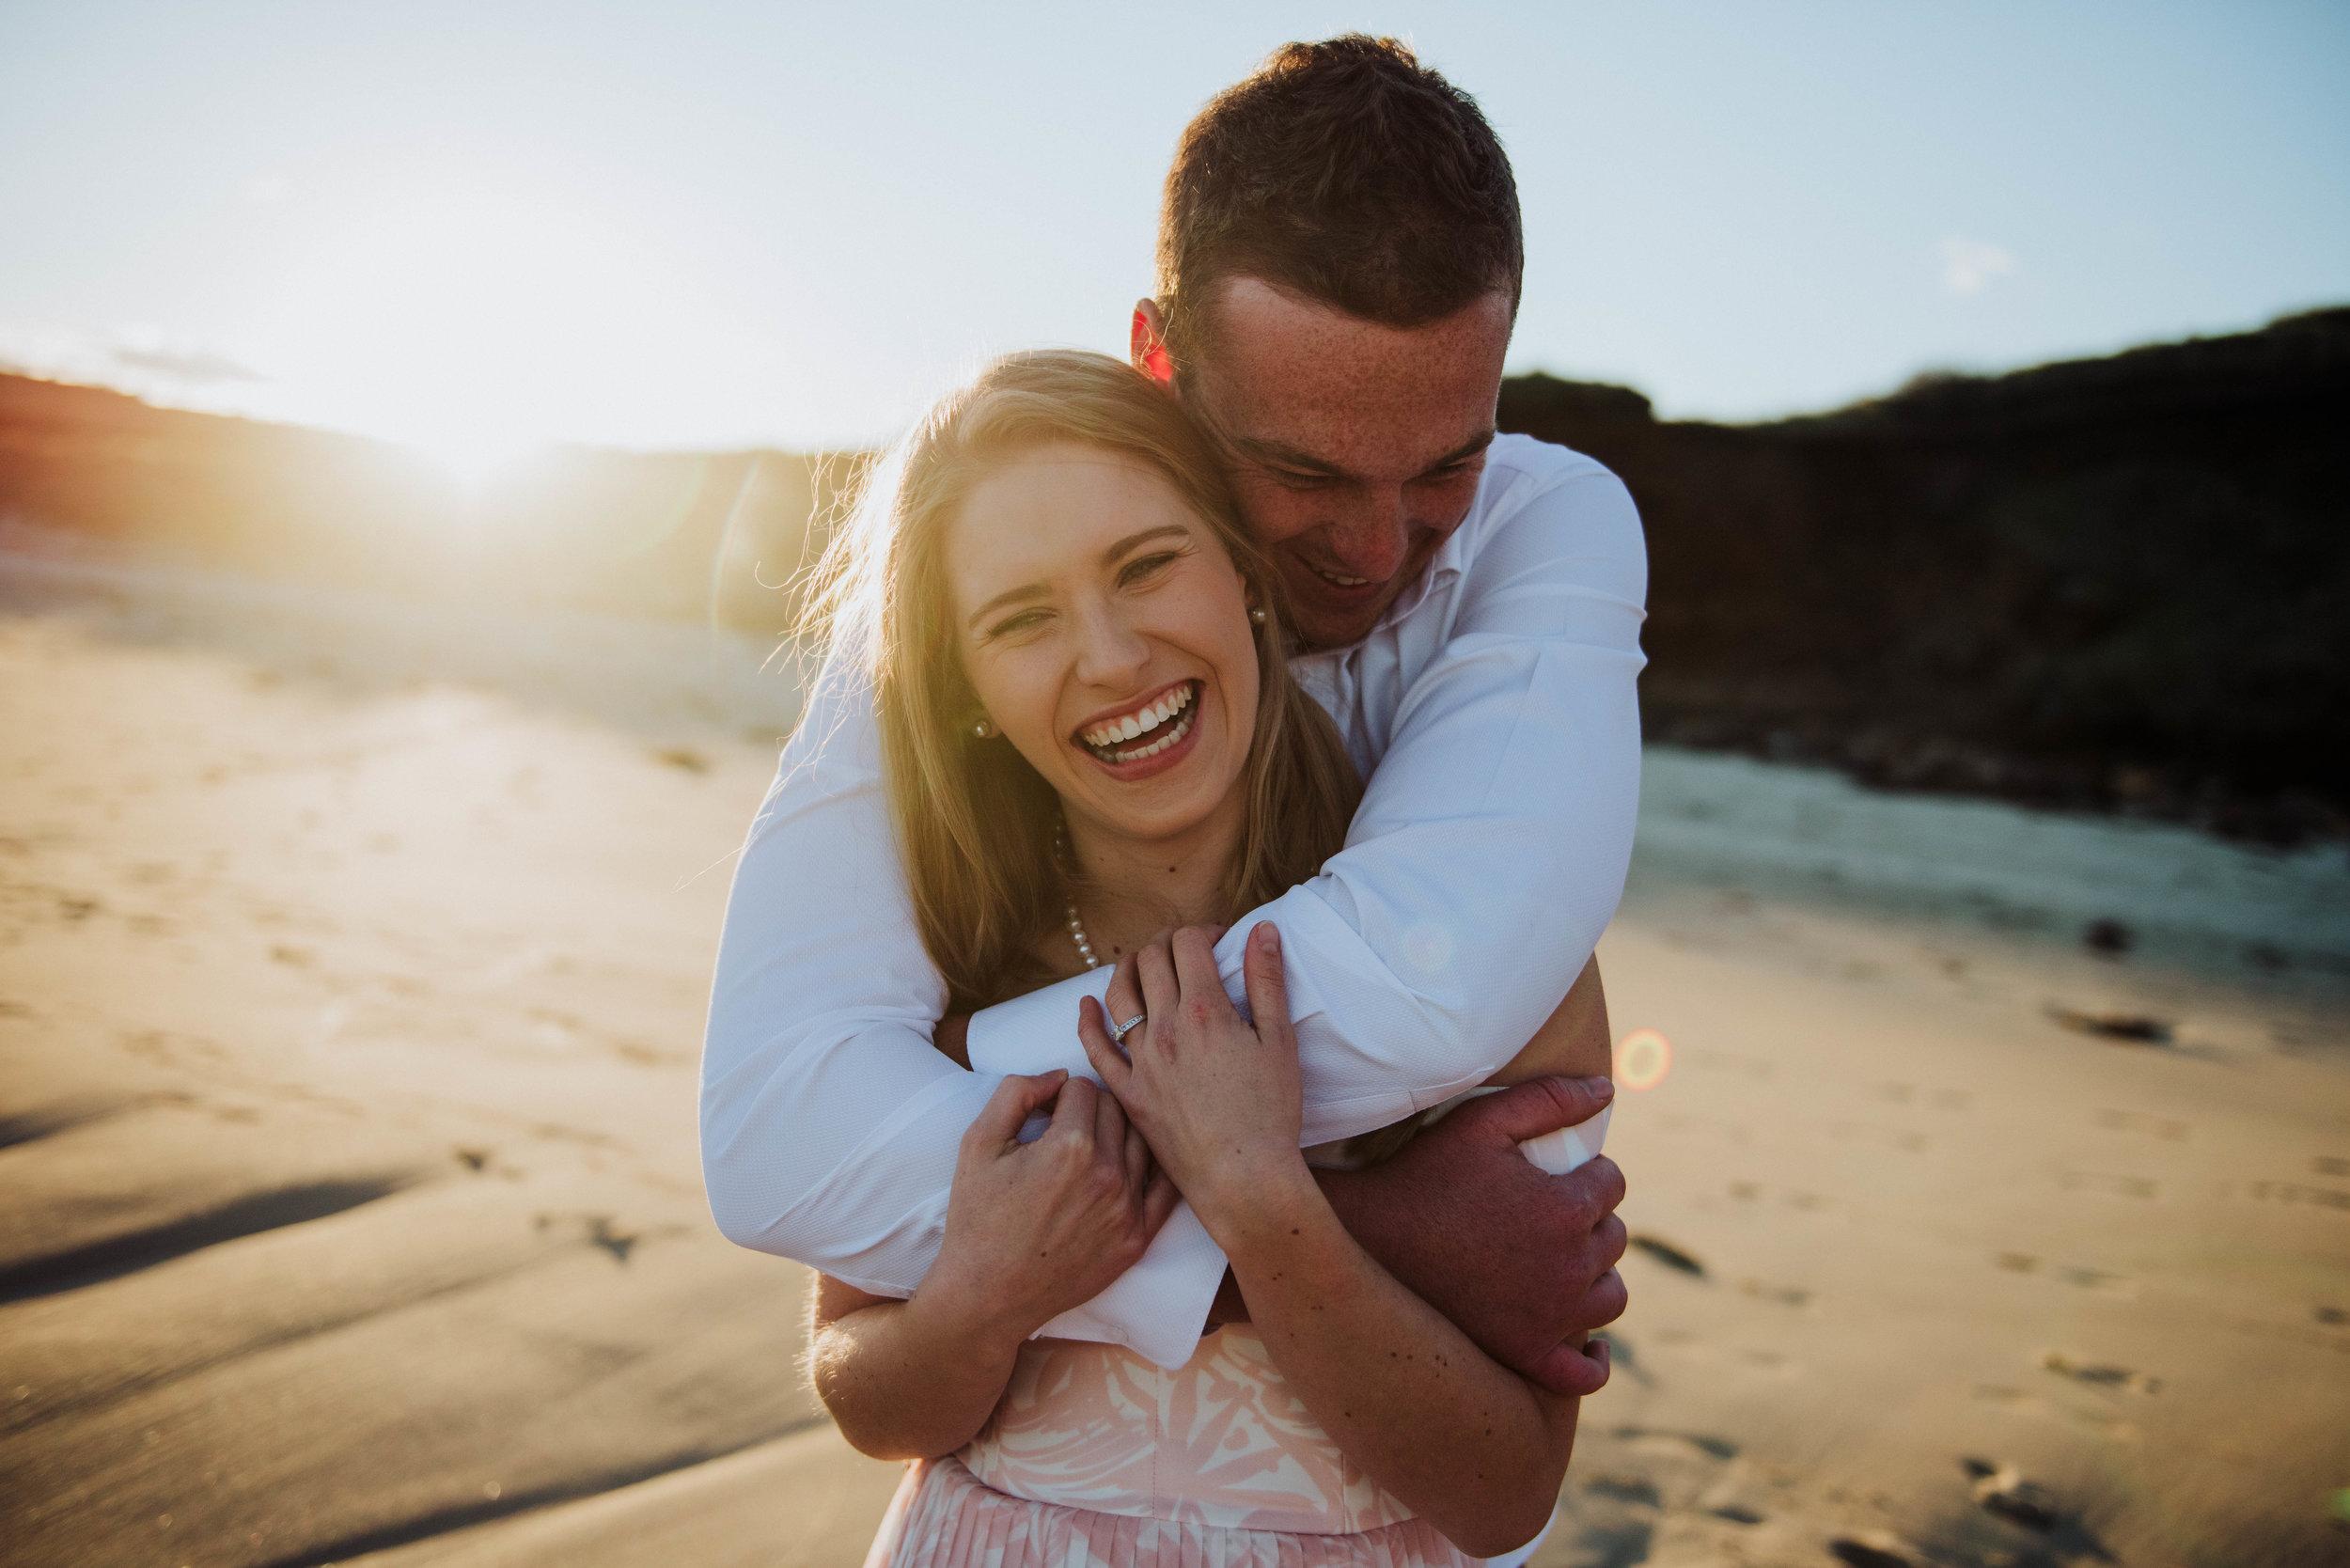 Tahlia & Matt - Killalea Engagement      9th July 2017